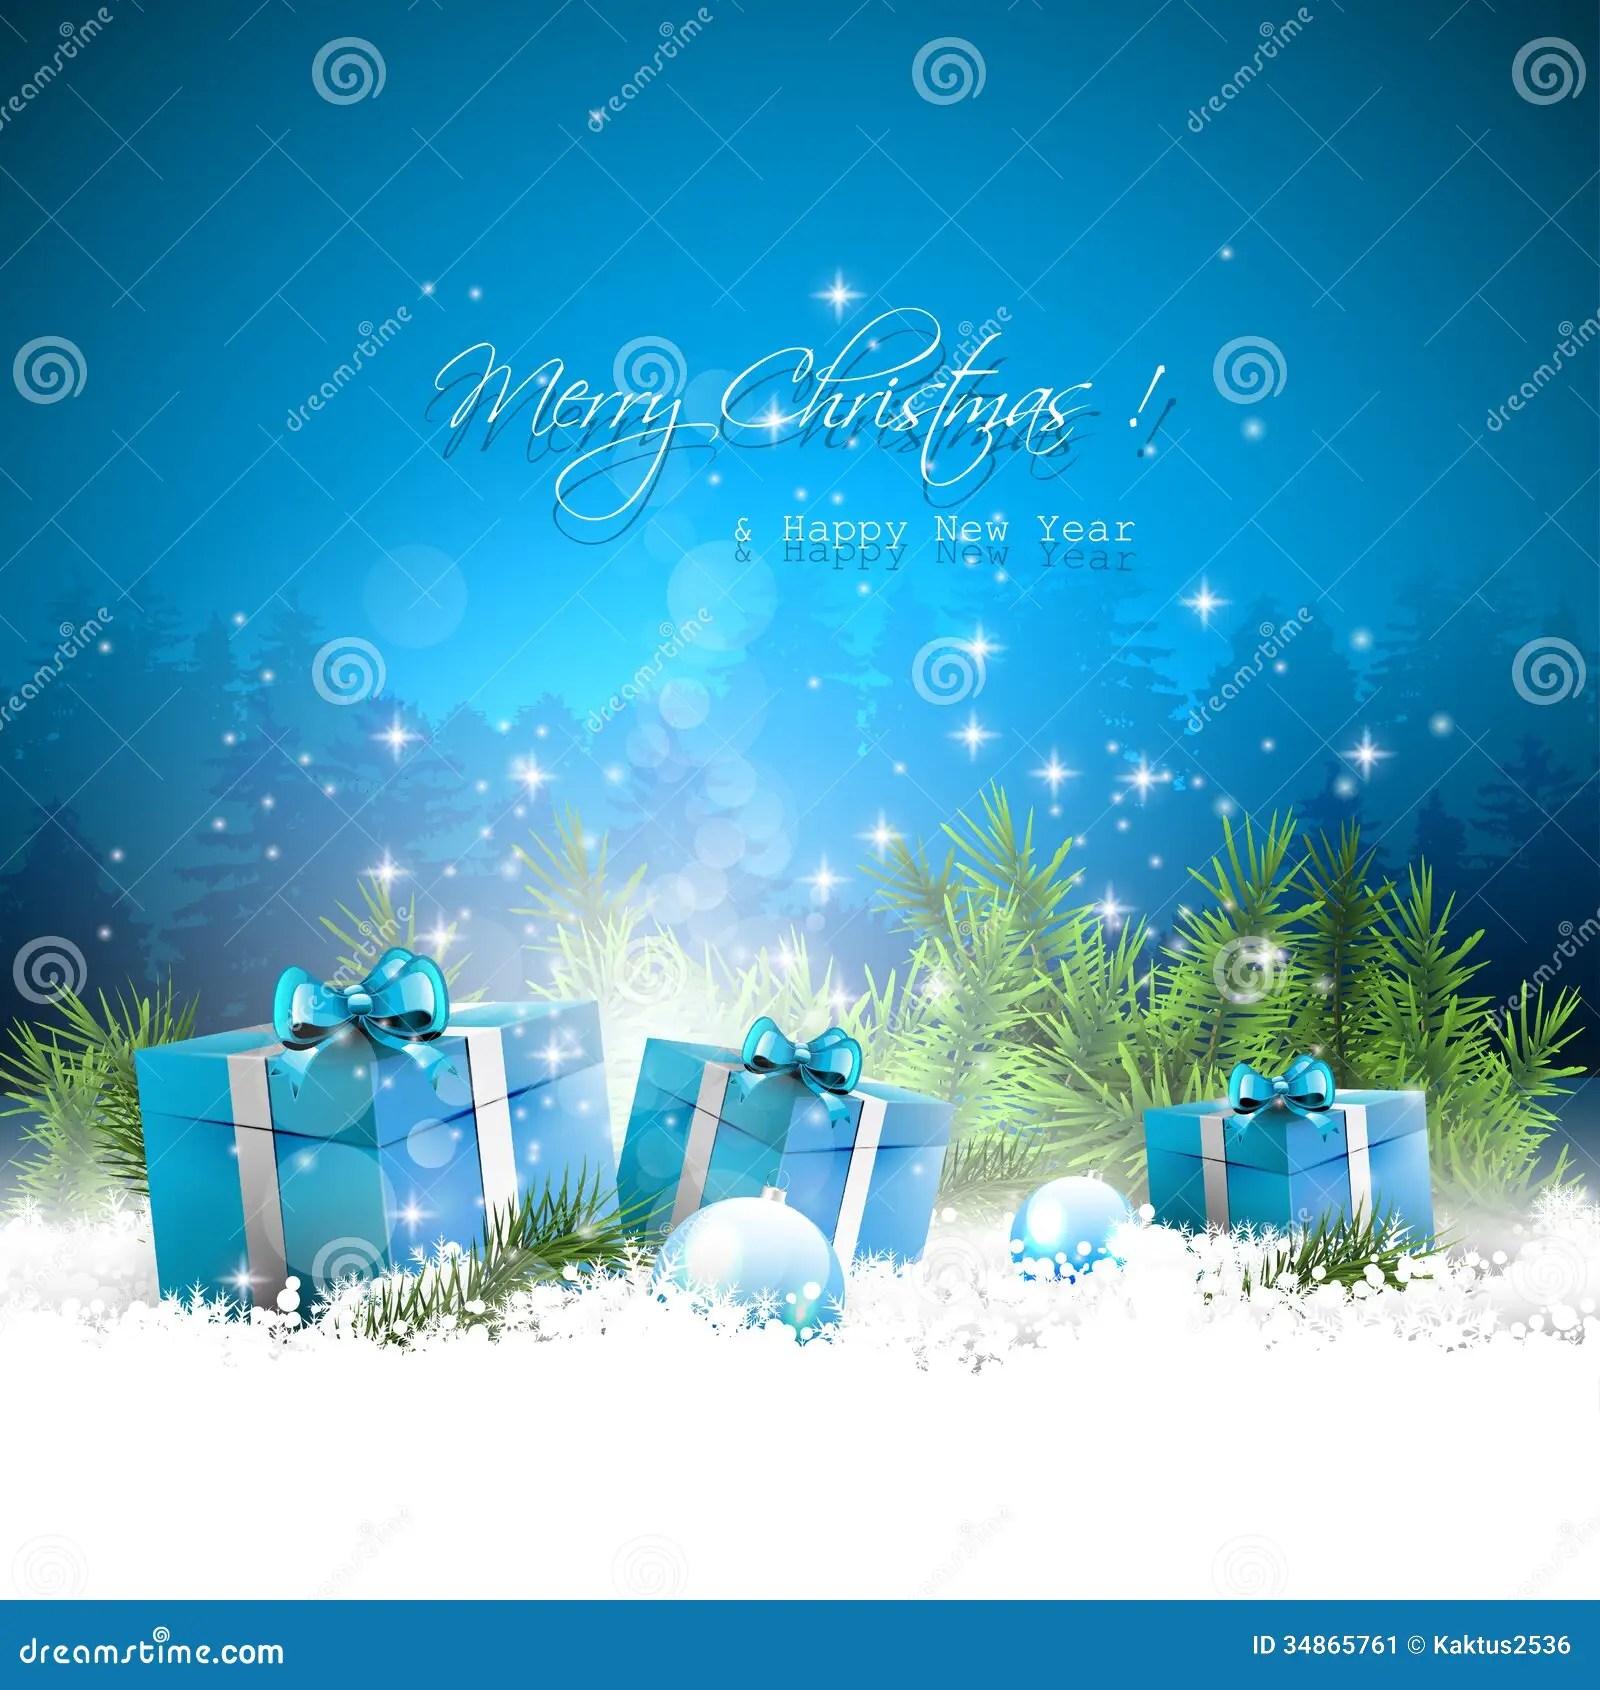 Blue Christmas Greeting Card Stock Vector Illustration